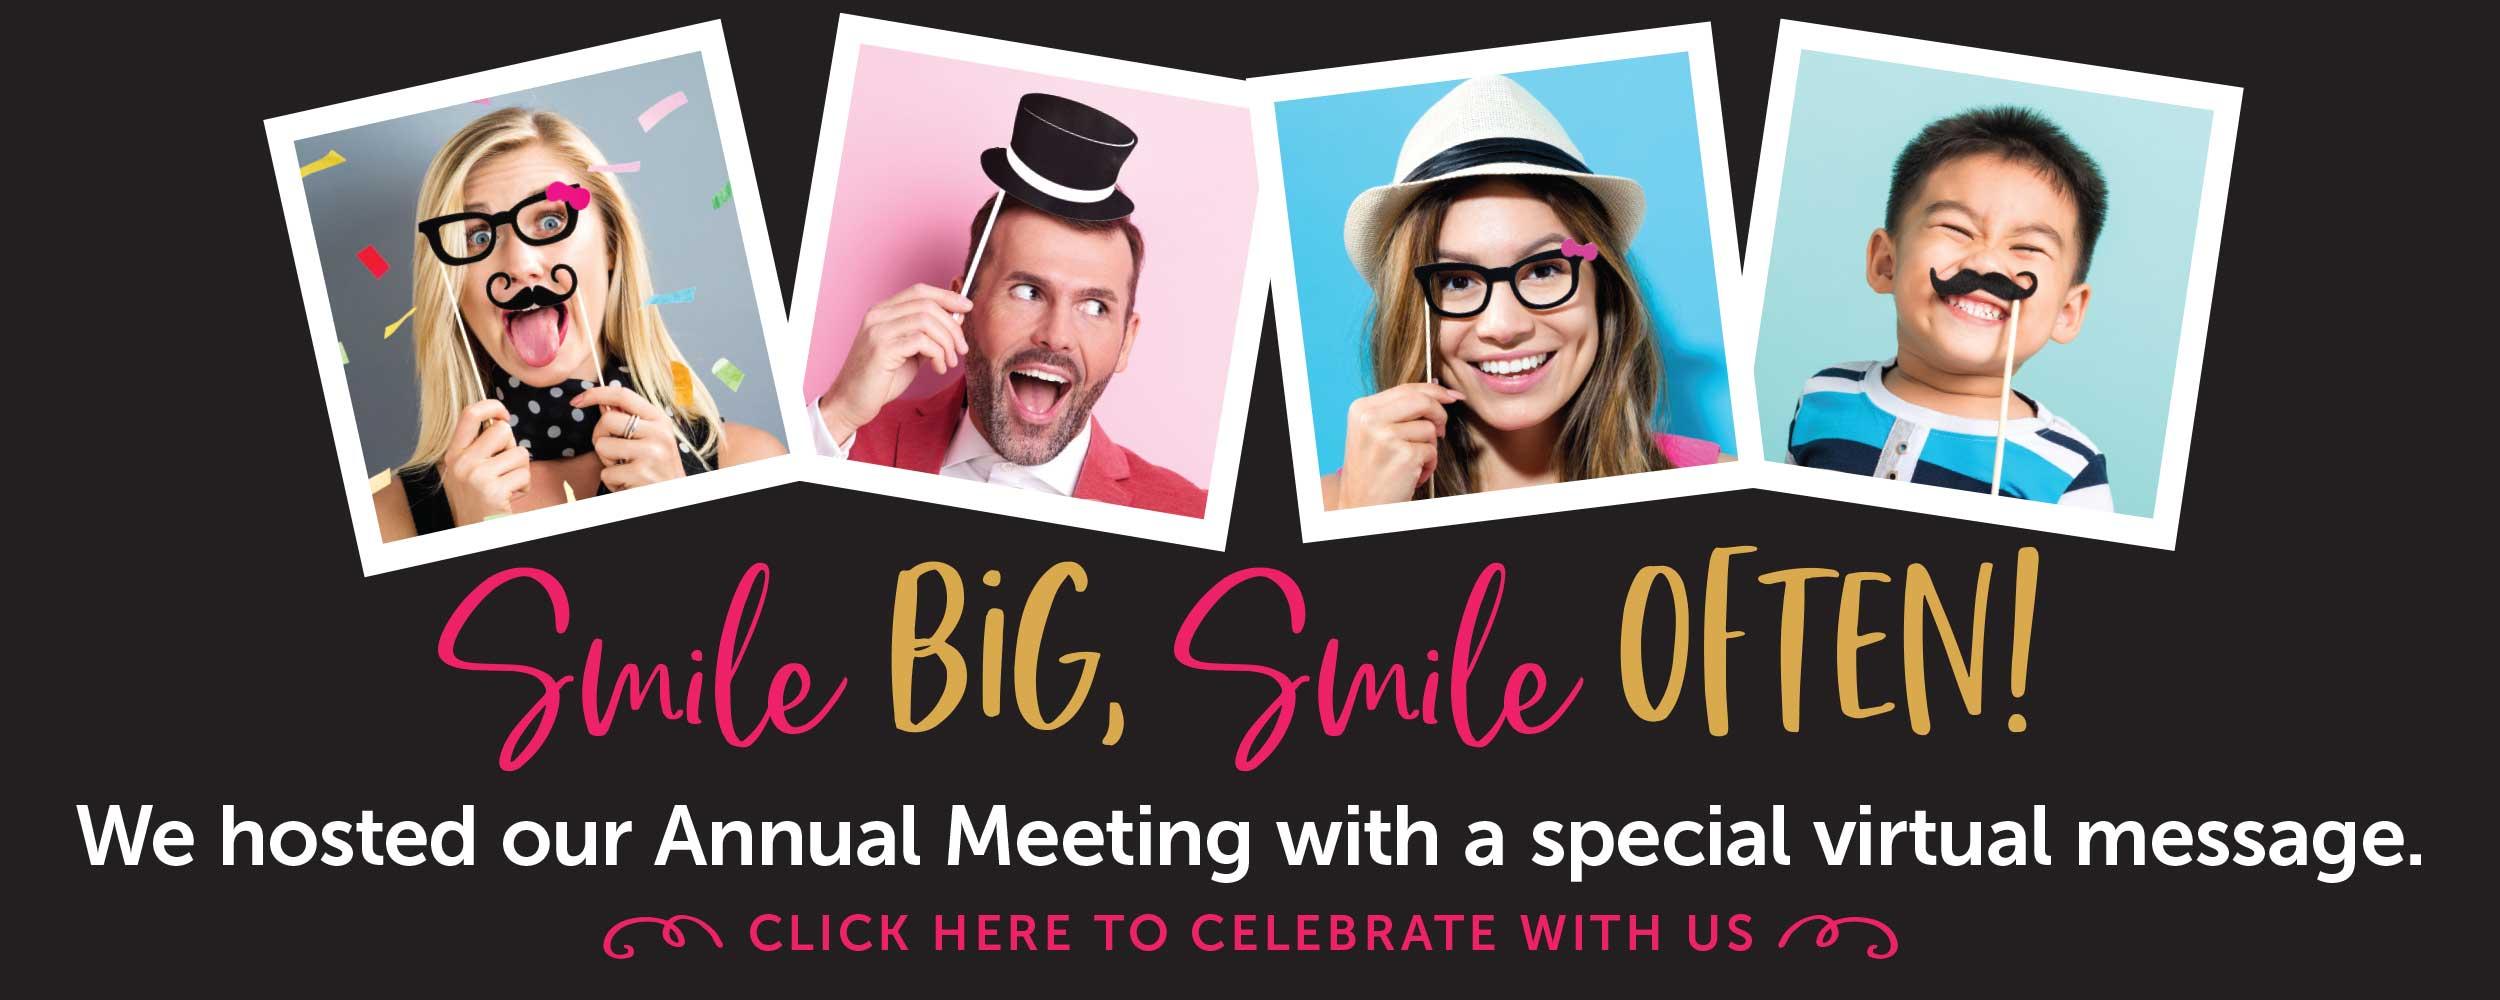 ffr annual meeting pop up